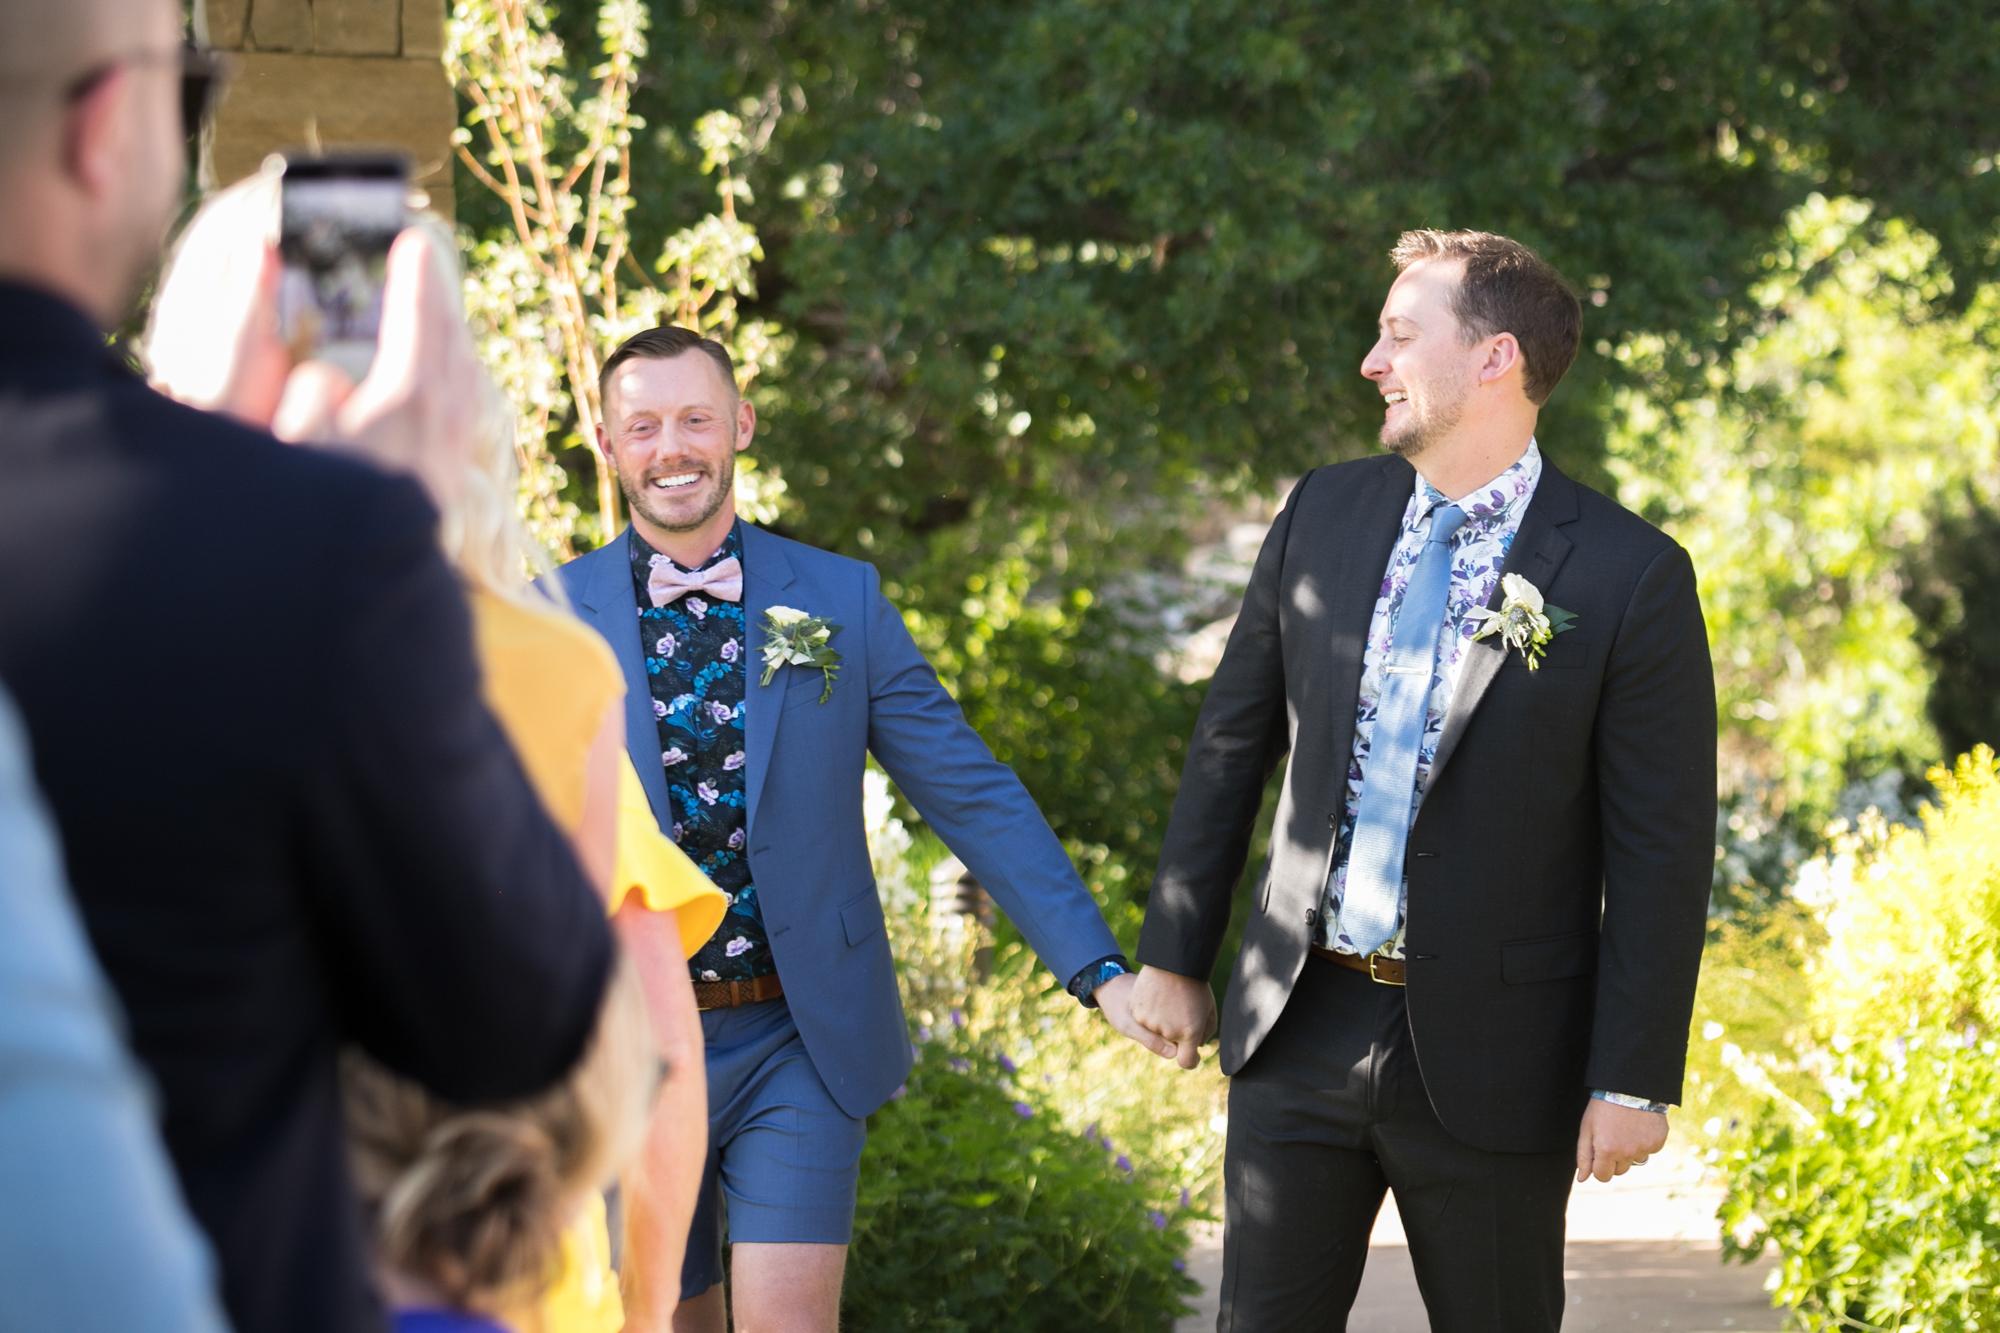 same-sex-wedding-red-butte-garden-25.jpg